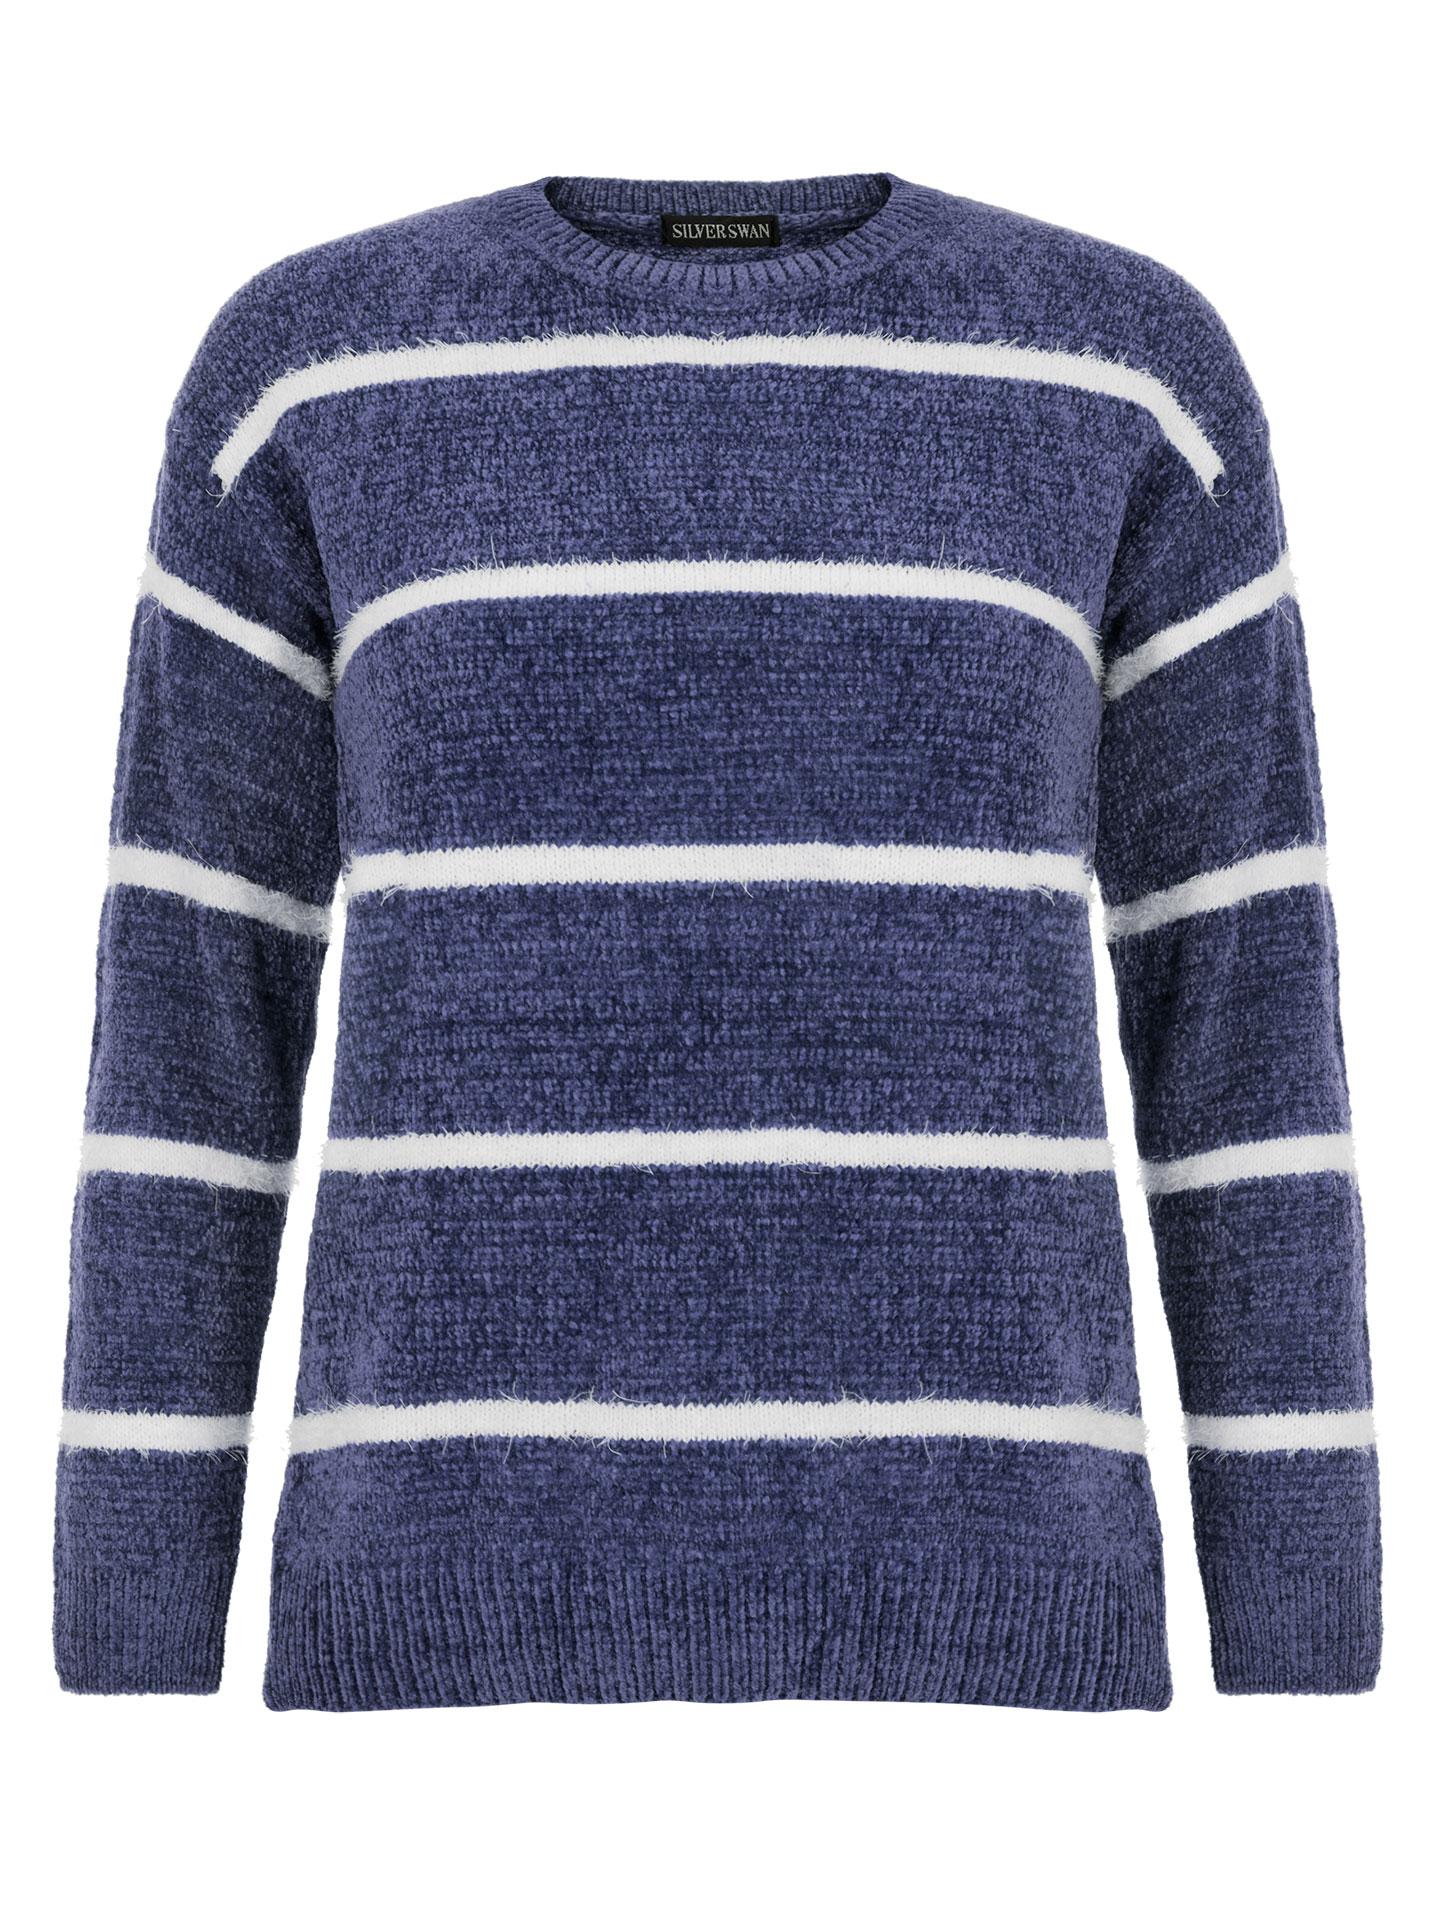 2cacec00bdef Chenille ριγέ πουλόβερ σε μπλε